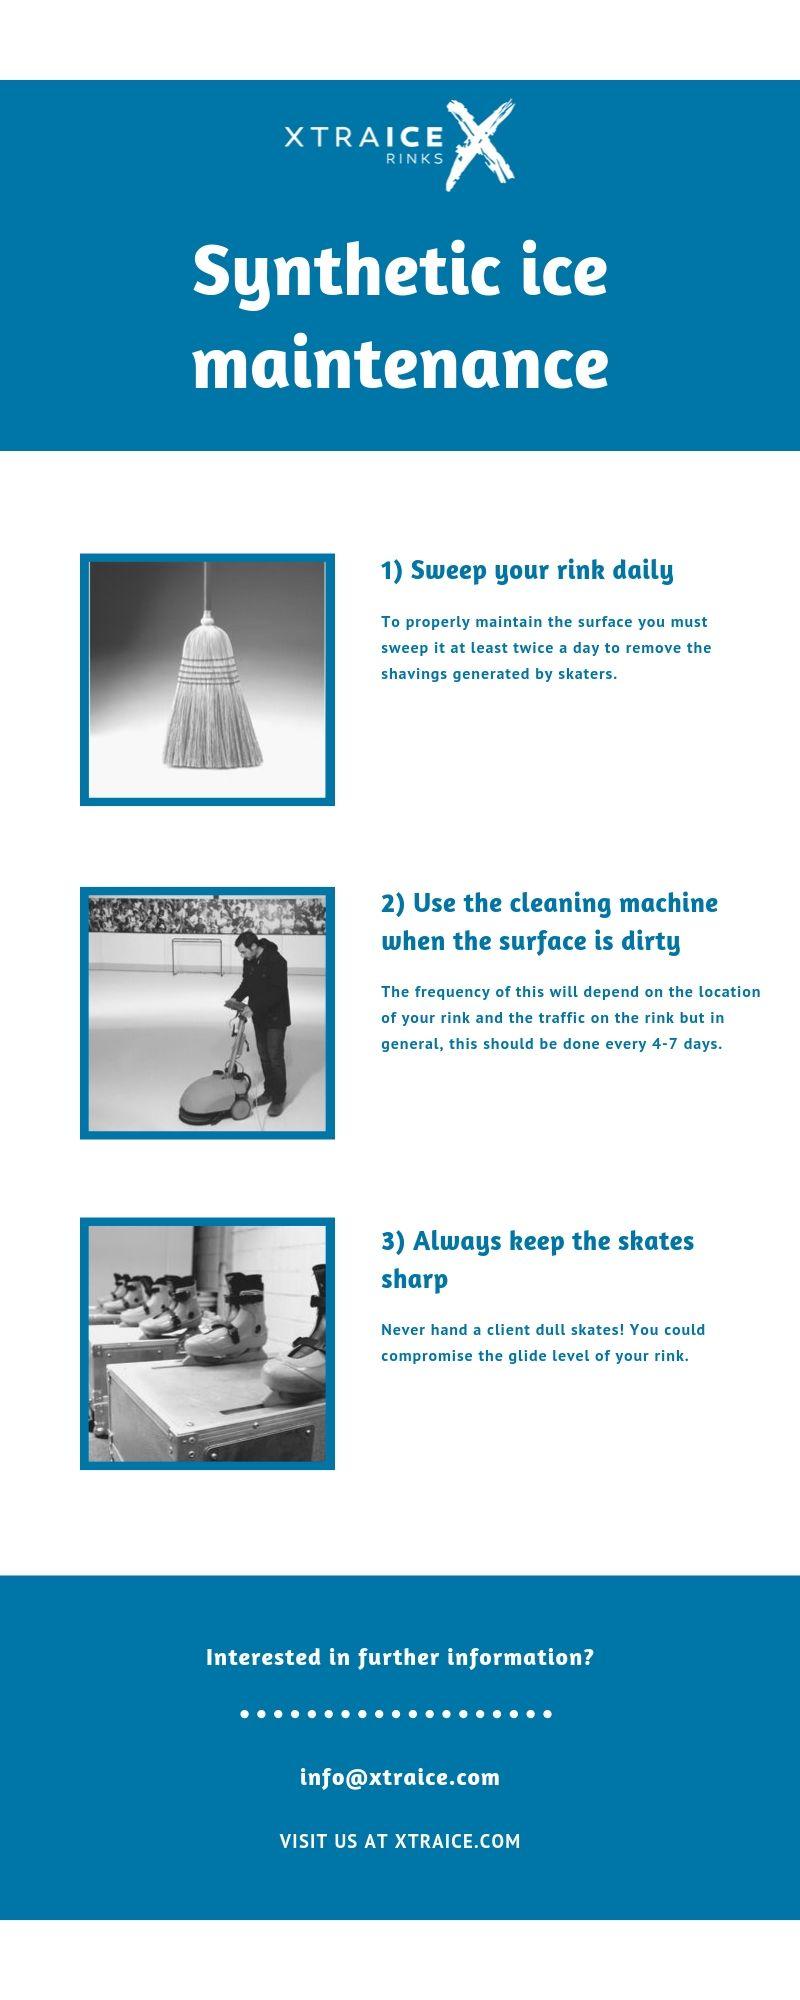 Synthetic ice maintenance